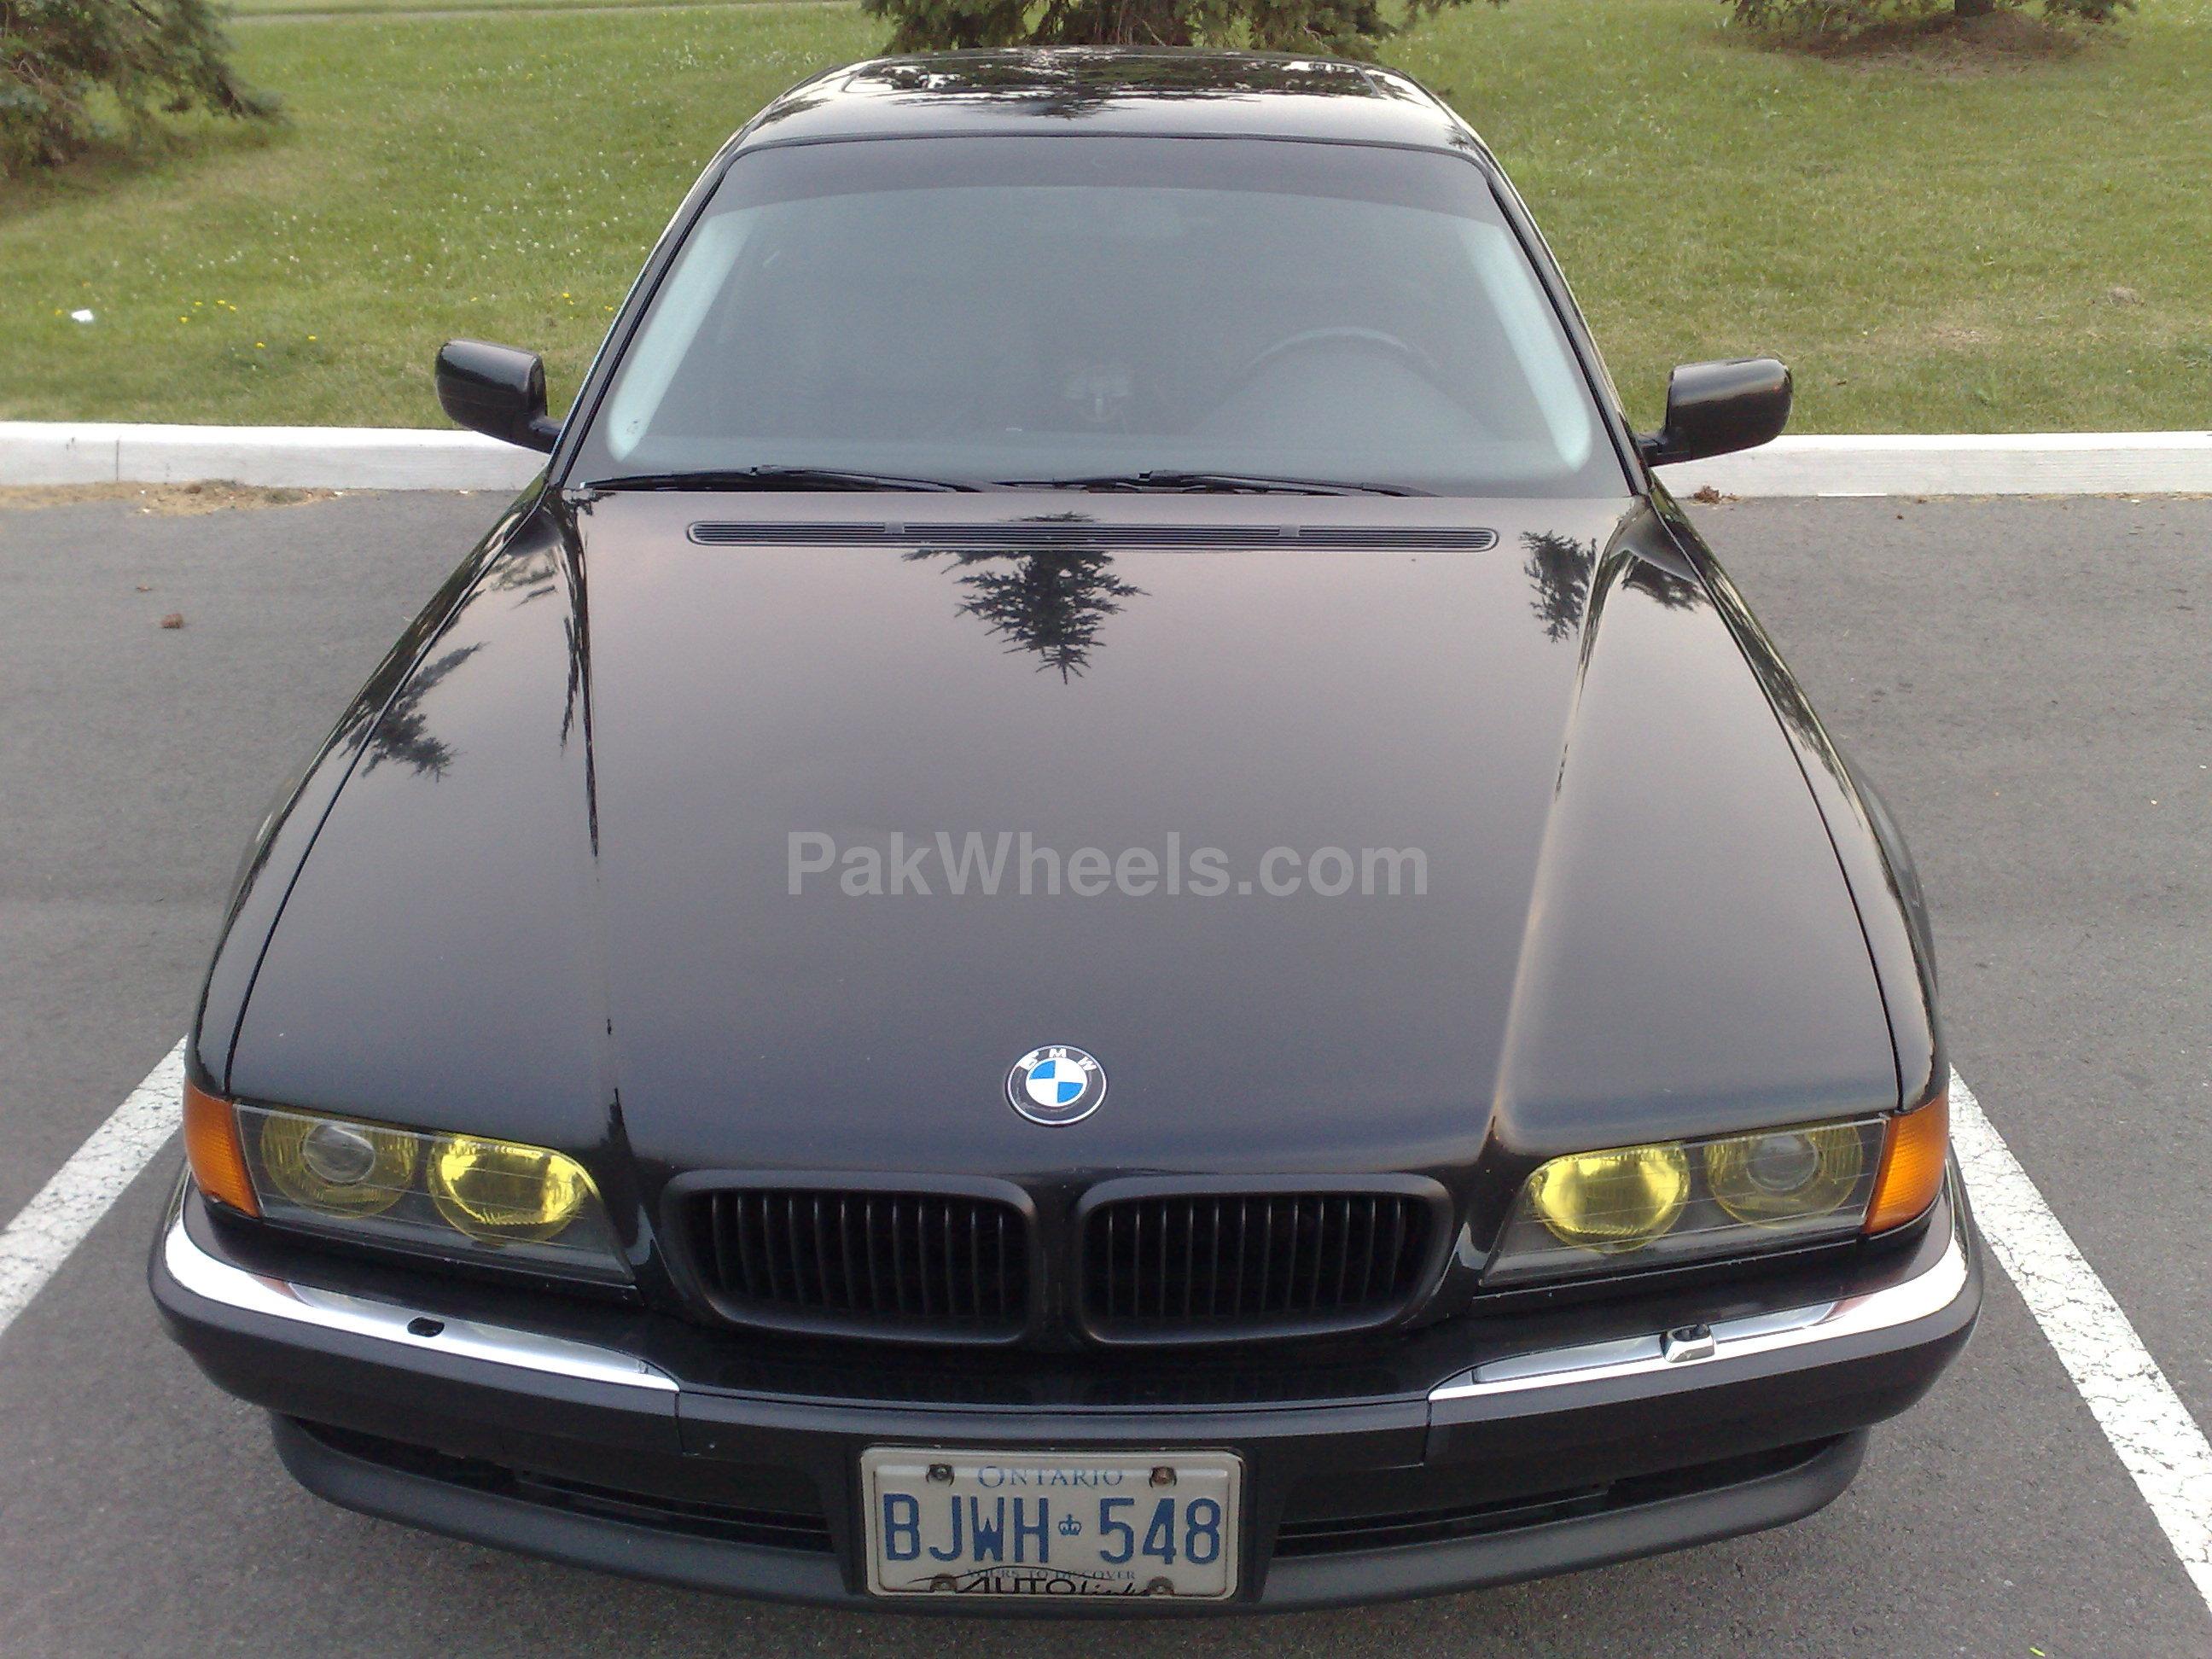 BMW 7 Series - 1998 My Dream Image-1